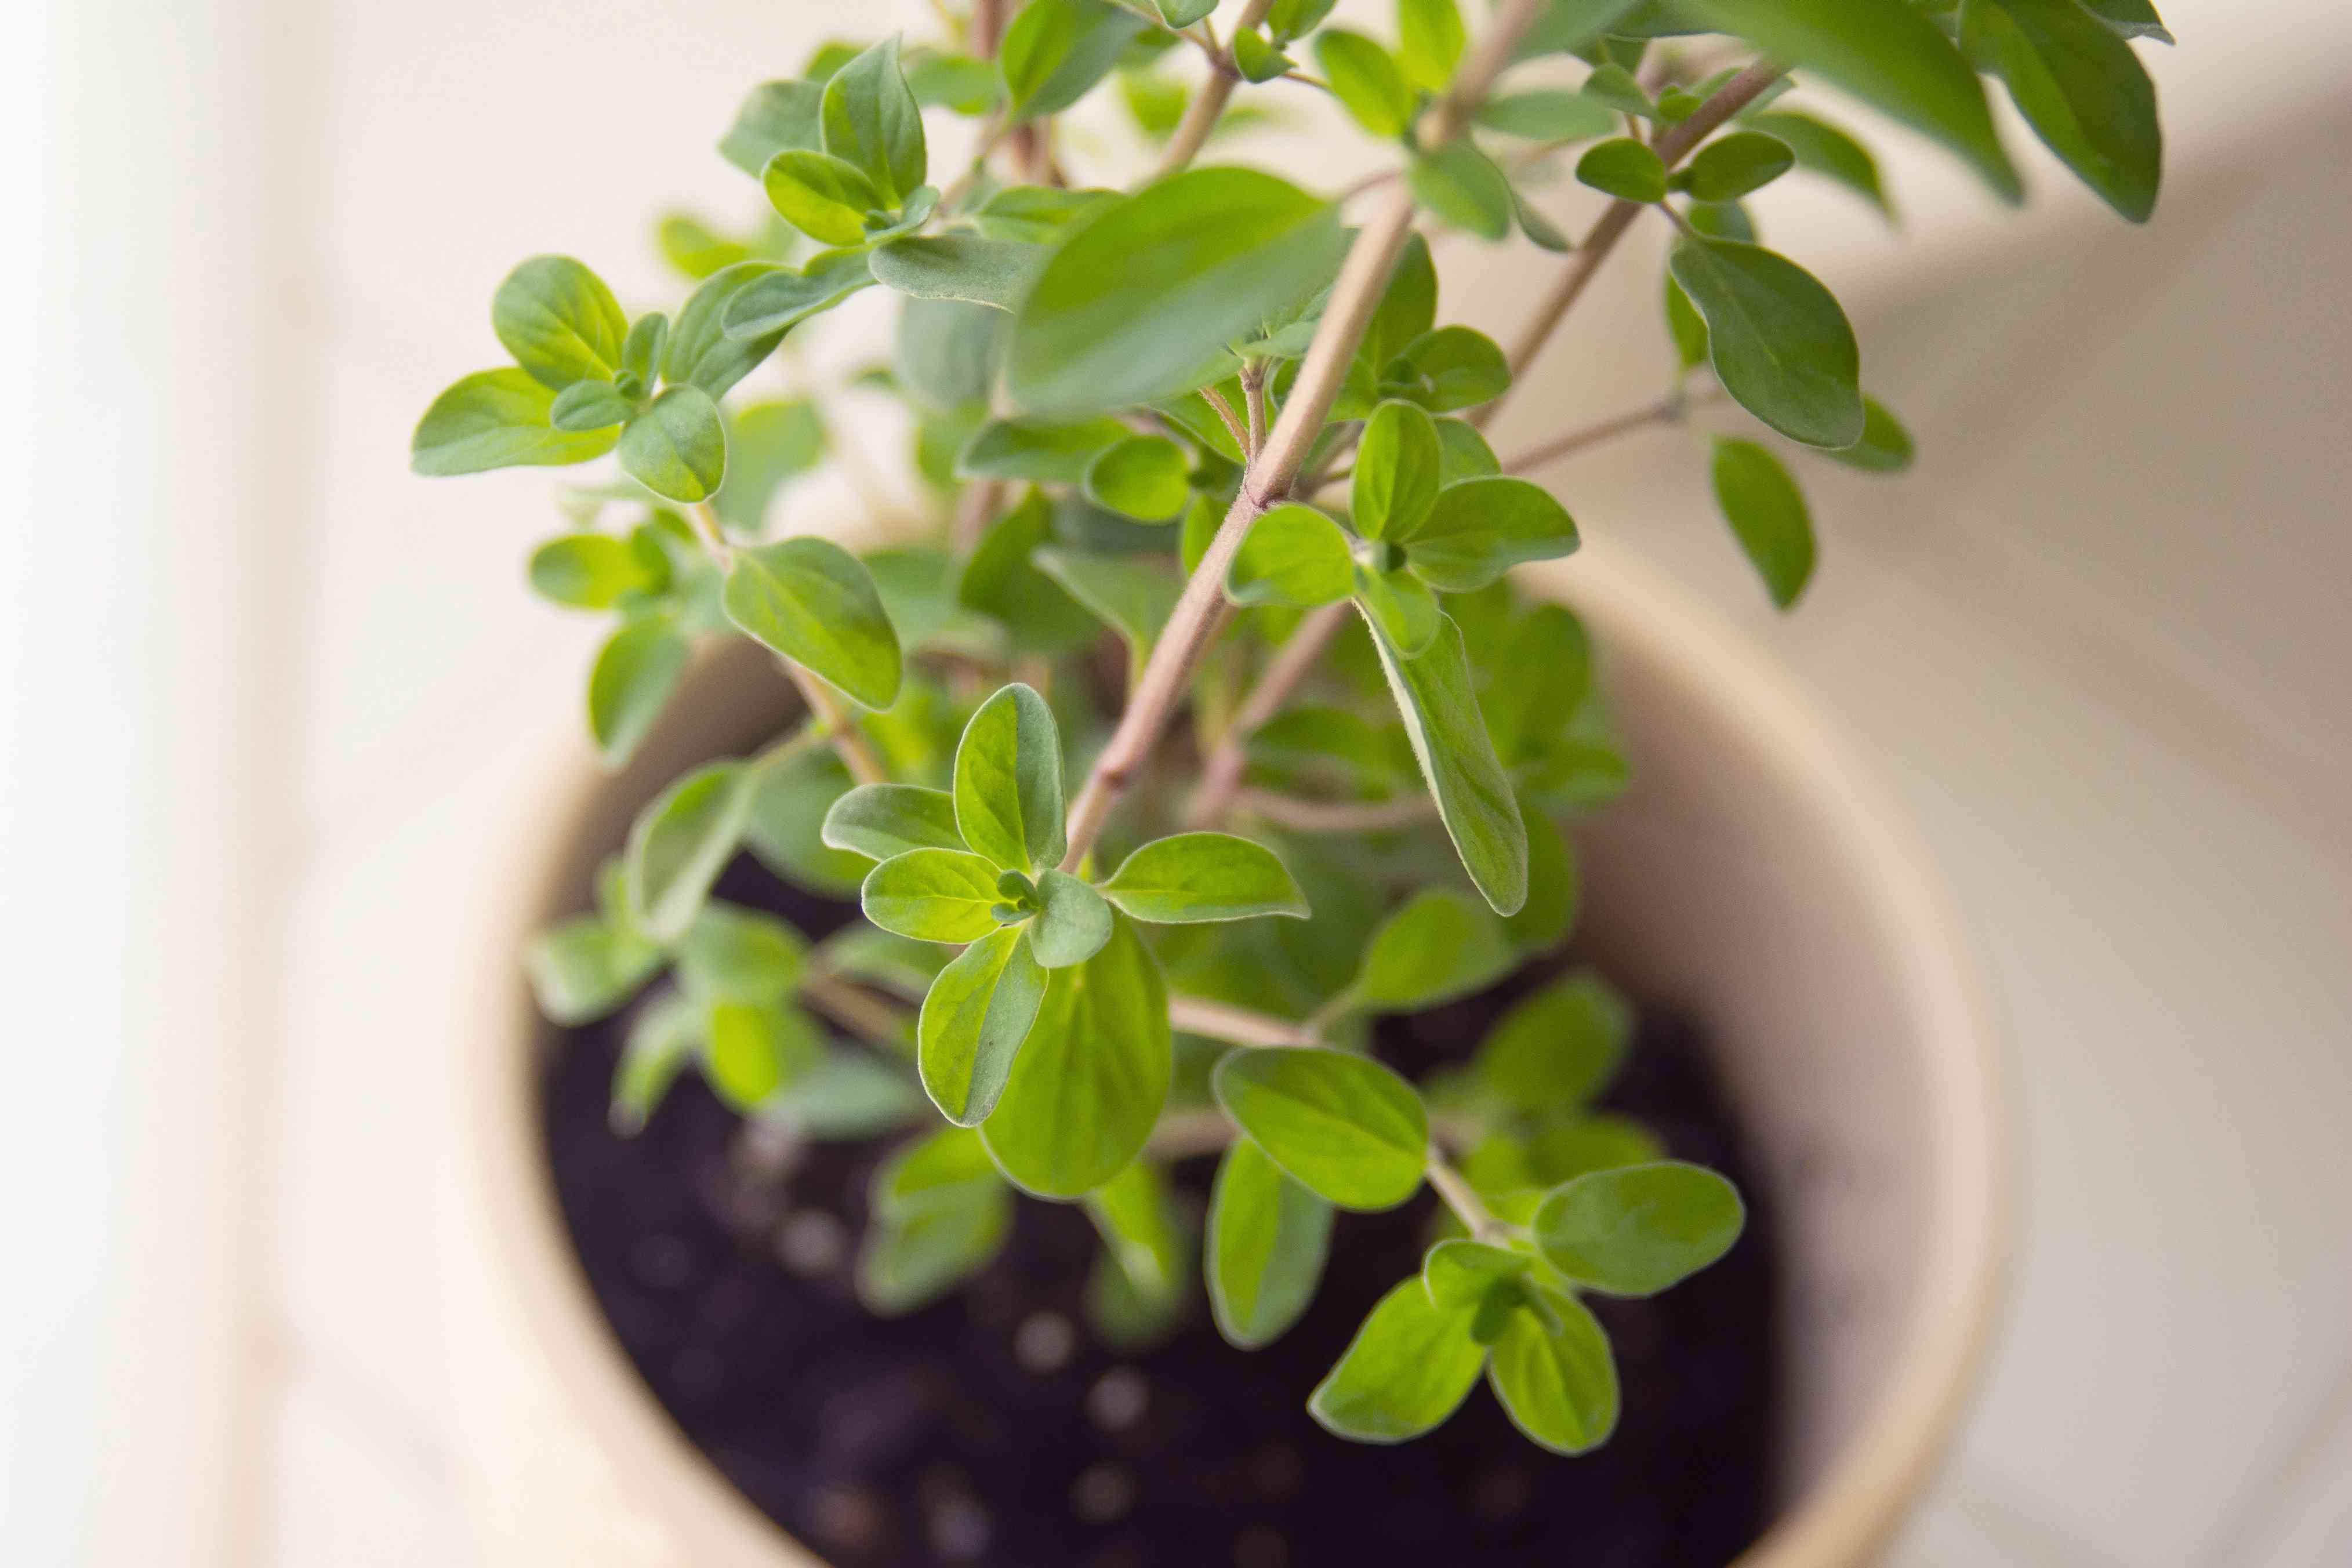 Sweet marjoram herb plant in cream colored pot closeup